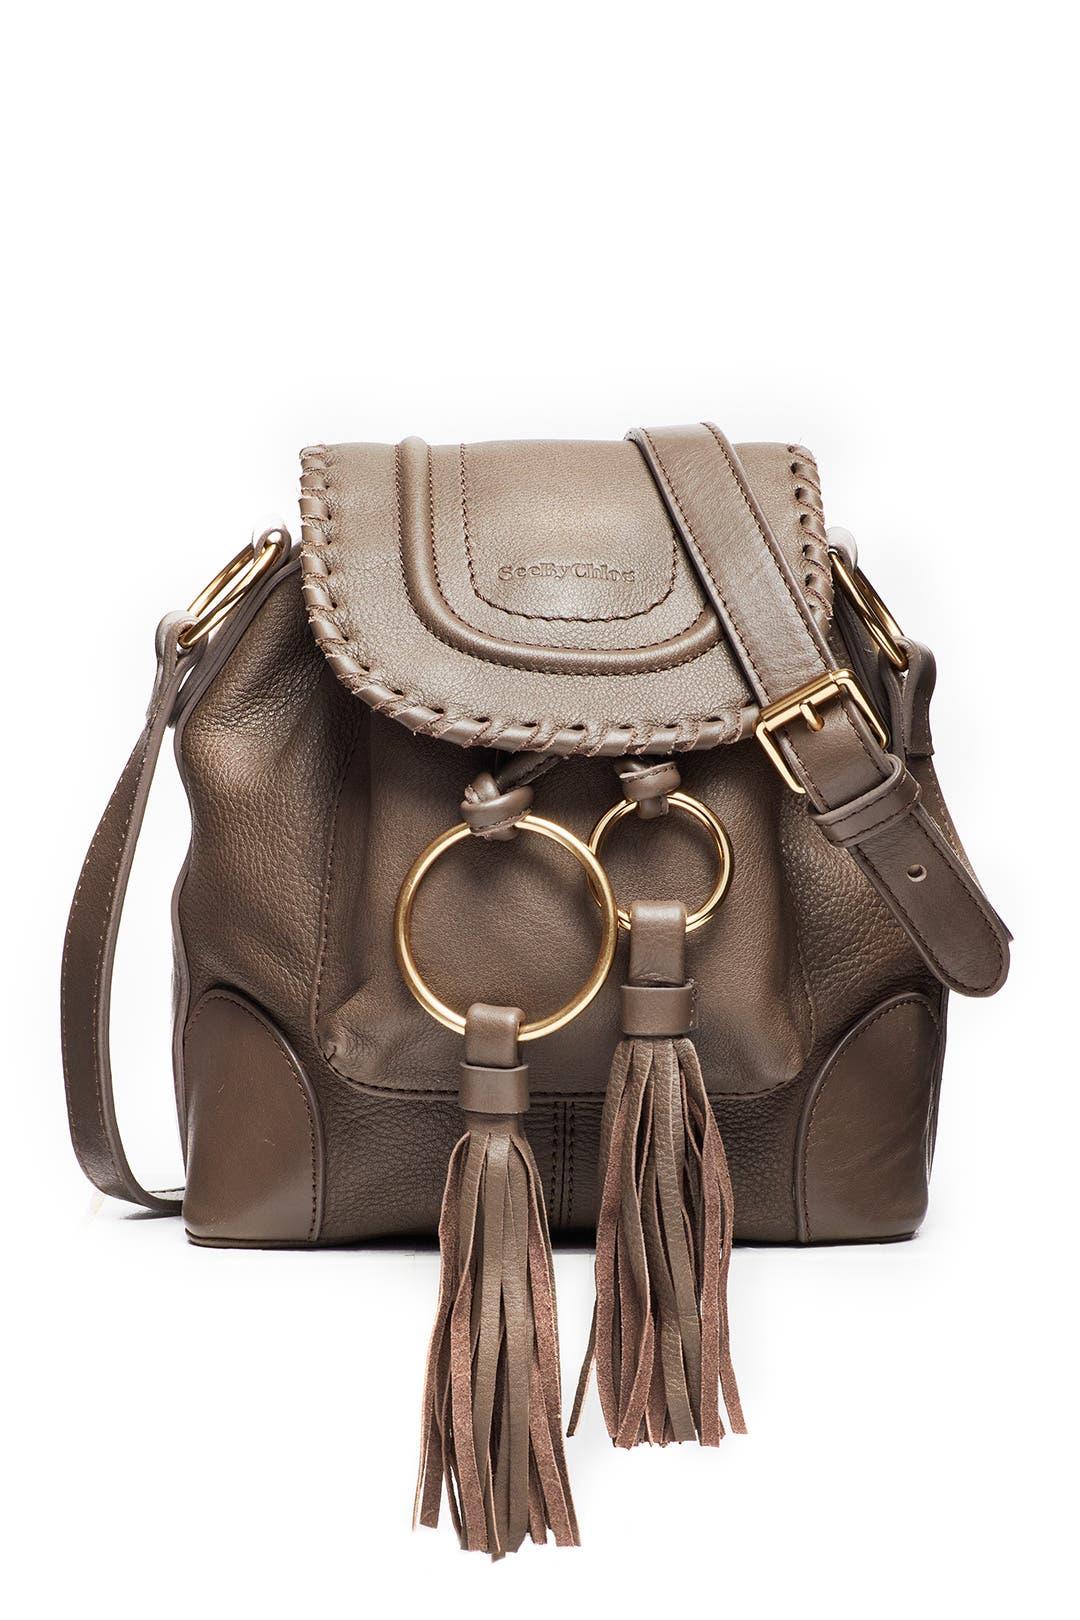 d6ddfaa883 See by Chloe Accessories Taupe Tassel Shoulder Bag